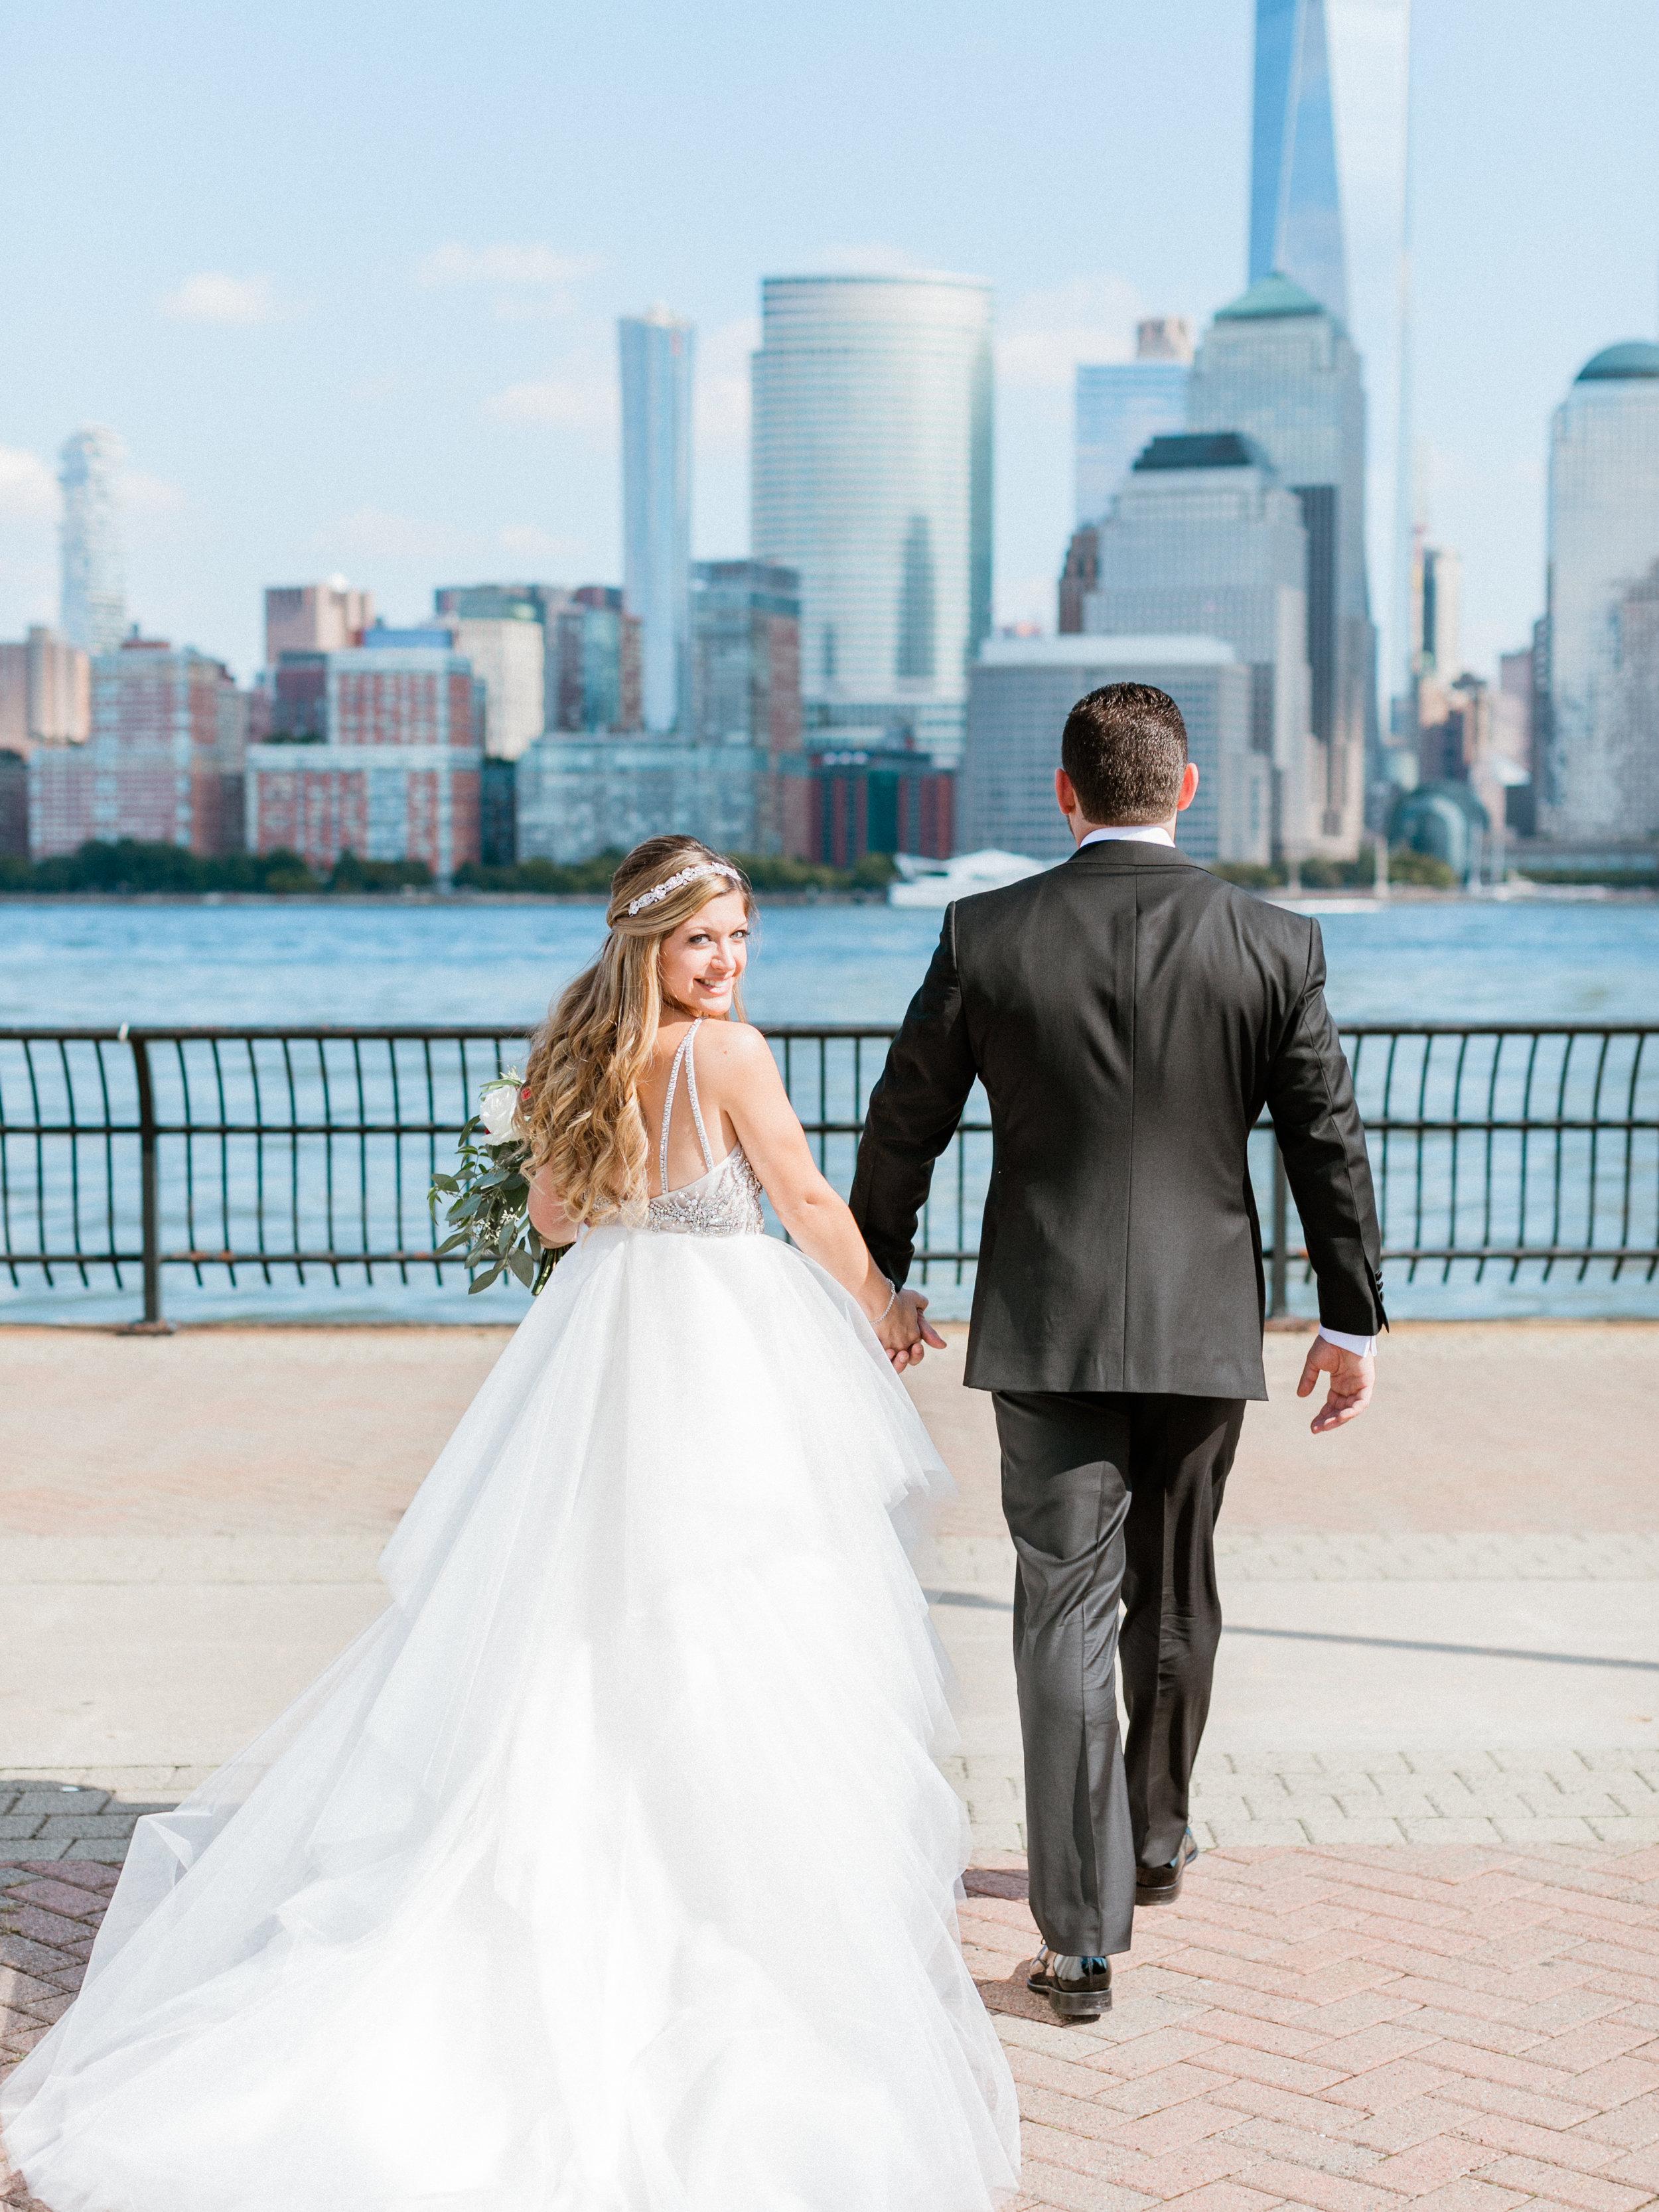 hyatt-regency-jersey-city-wedding-photographer24.jpg